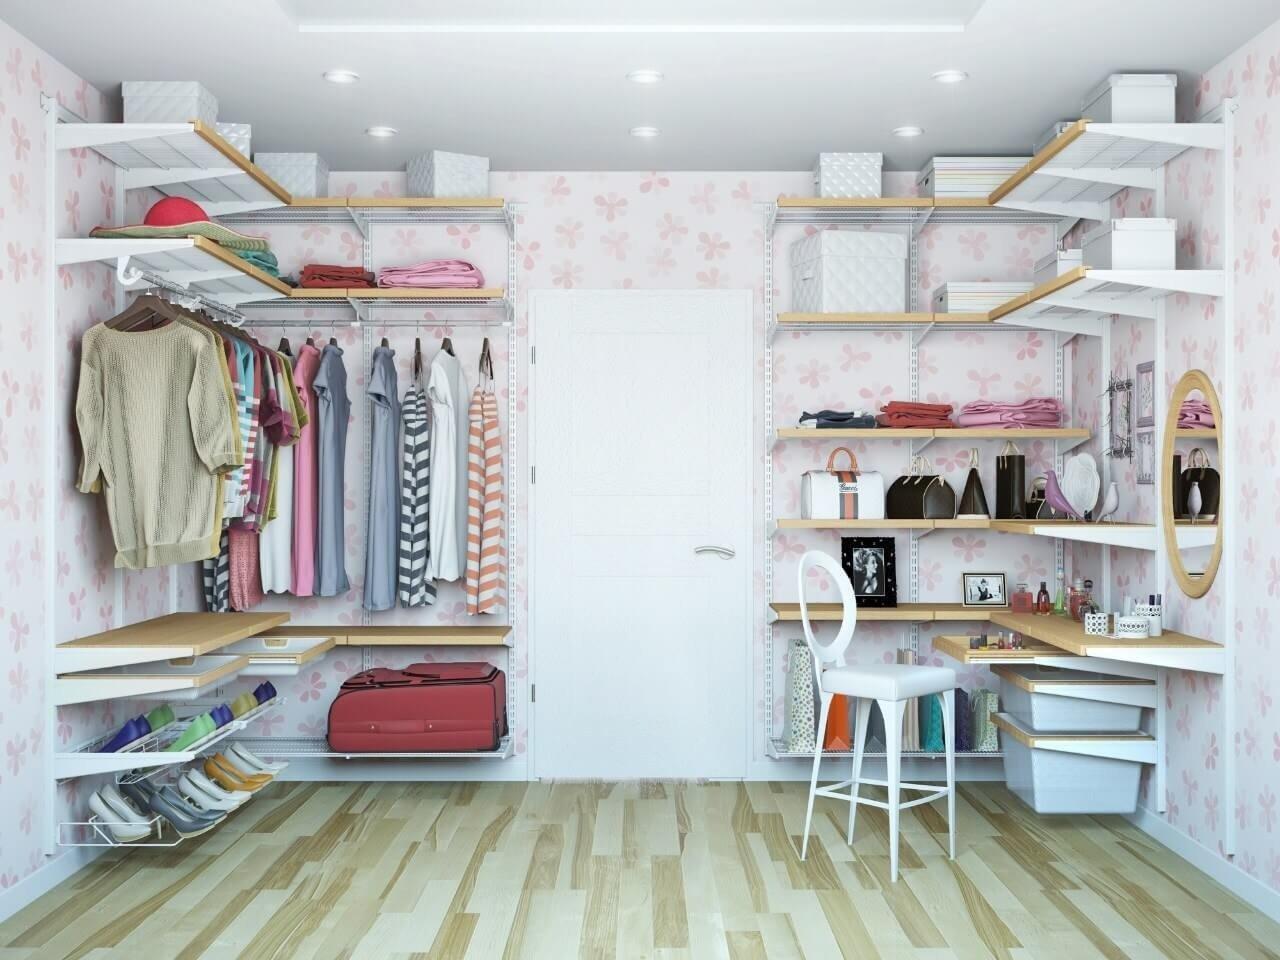 Фото гардеробных комнат своими руками фото 169